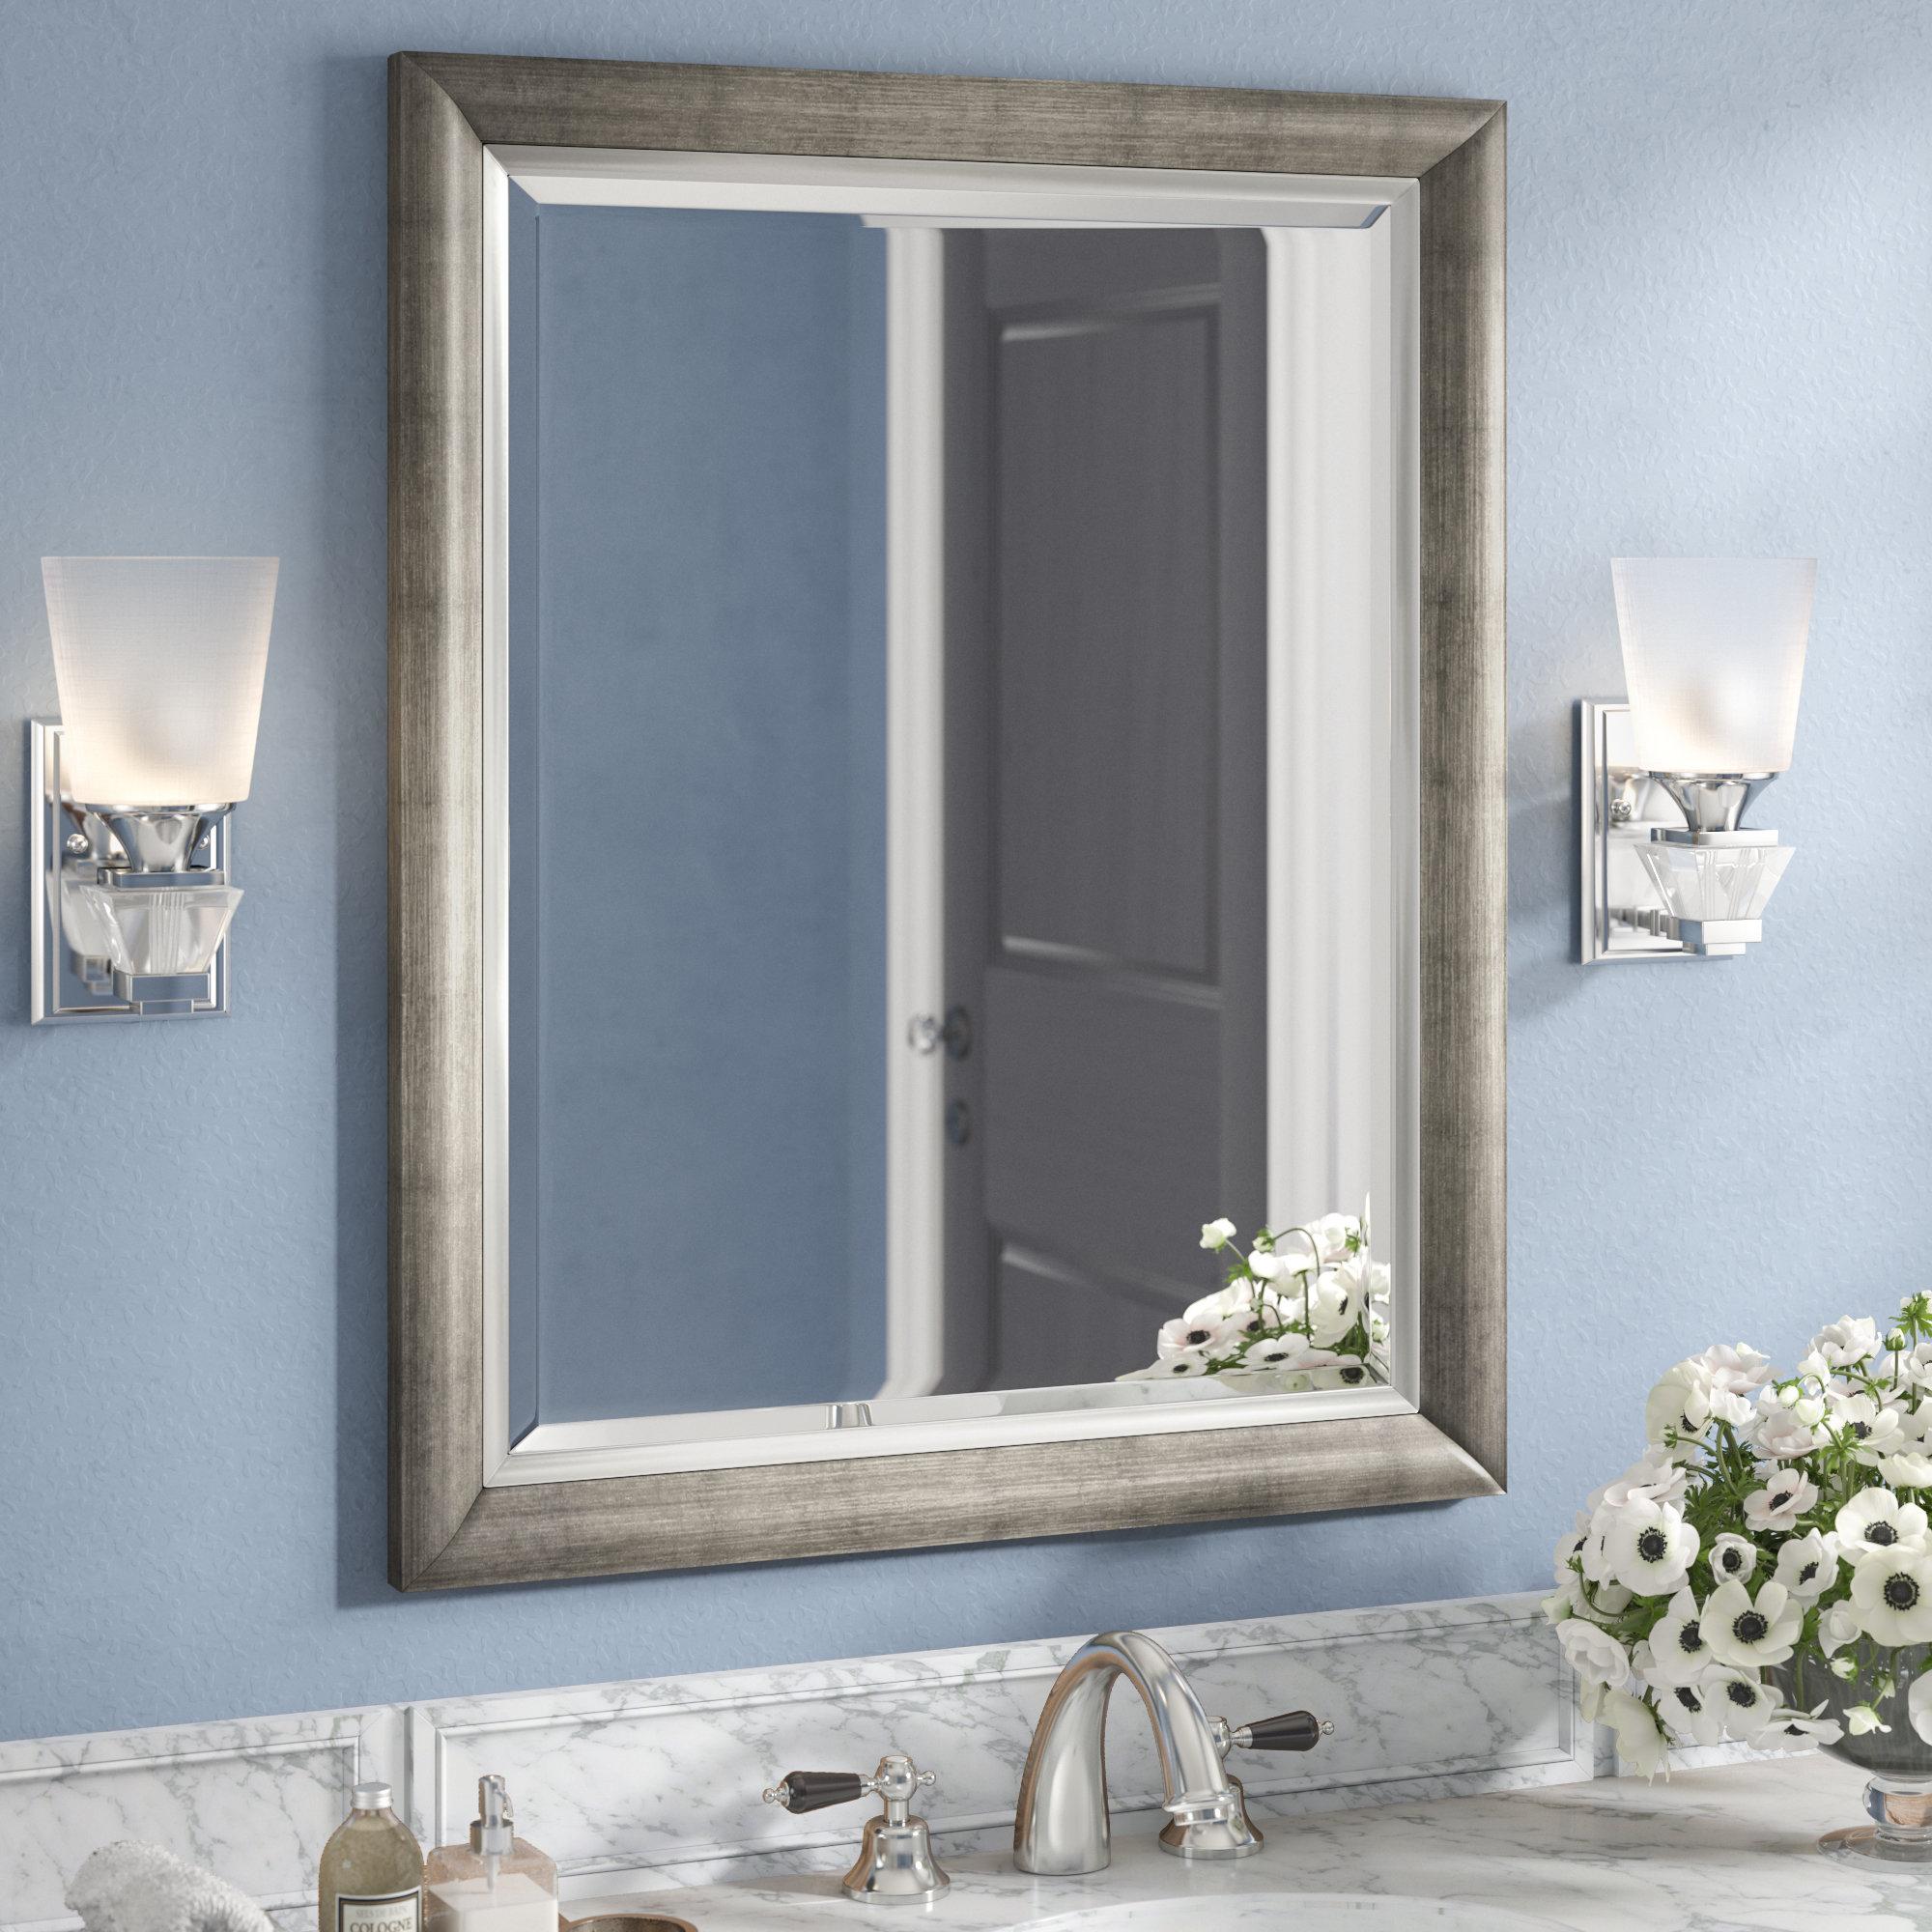 Wall Mirror Regarding Epinal Shabby Elegance Wall Mirrors (Image 20 of 20)